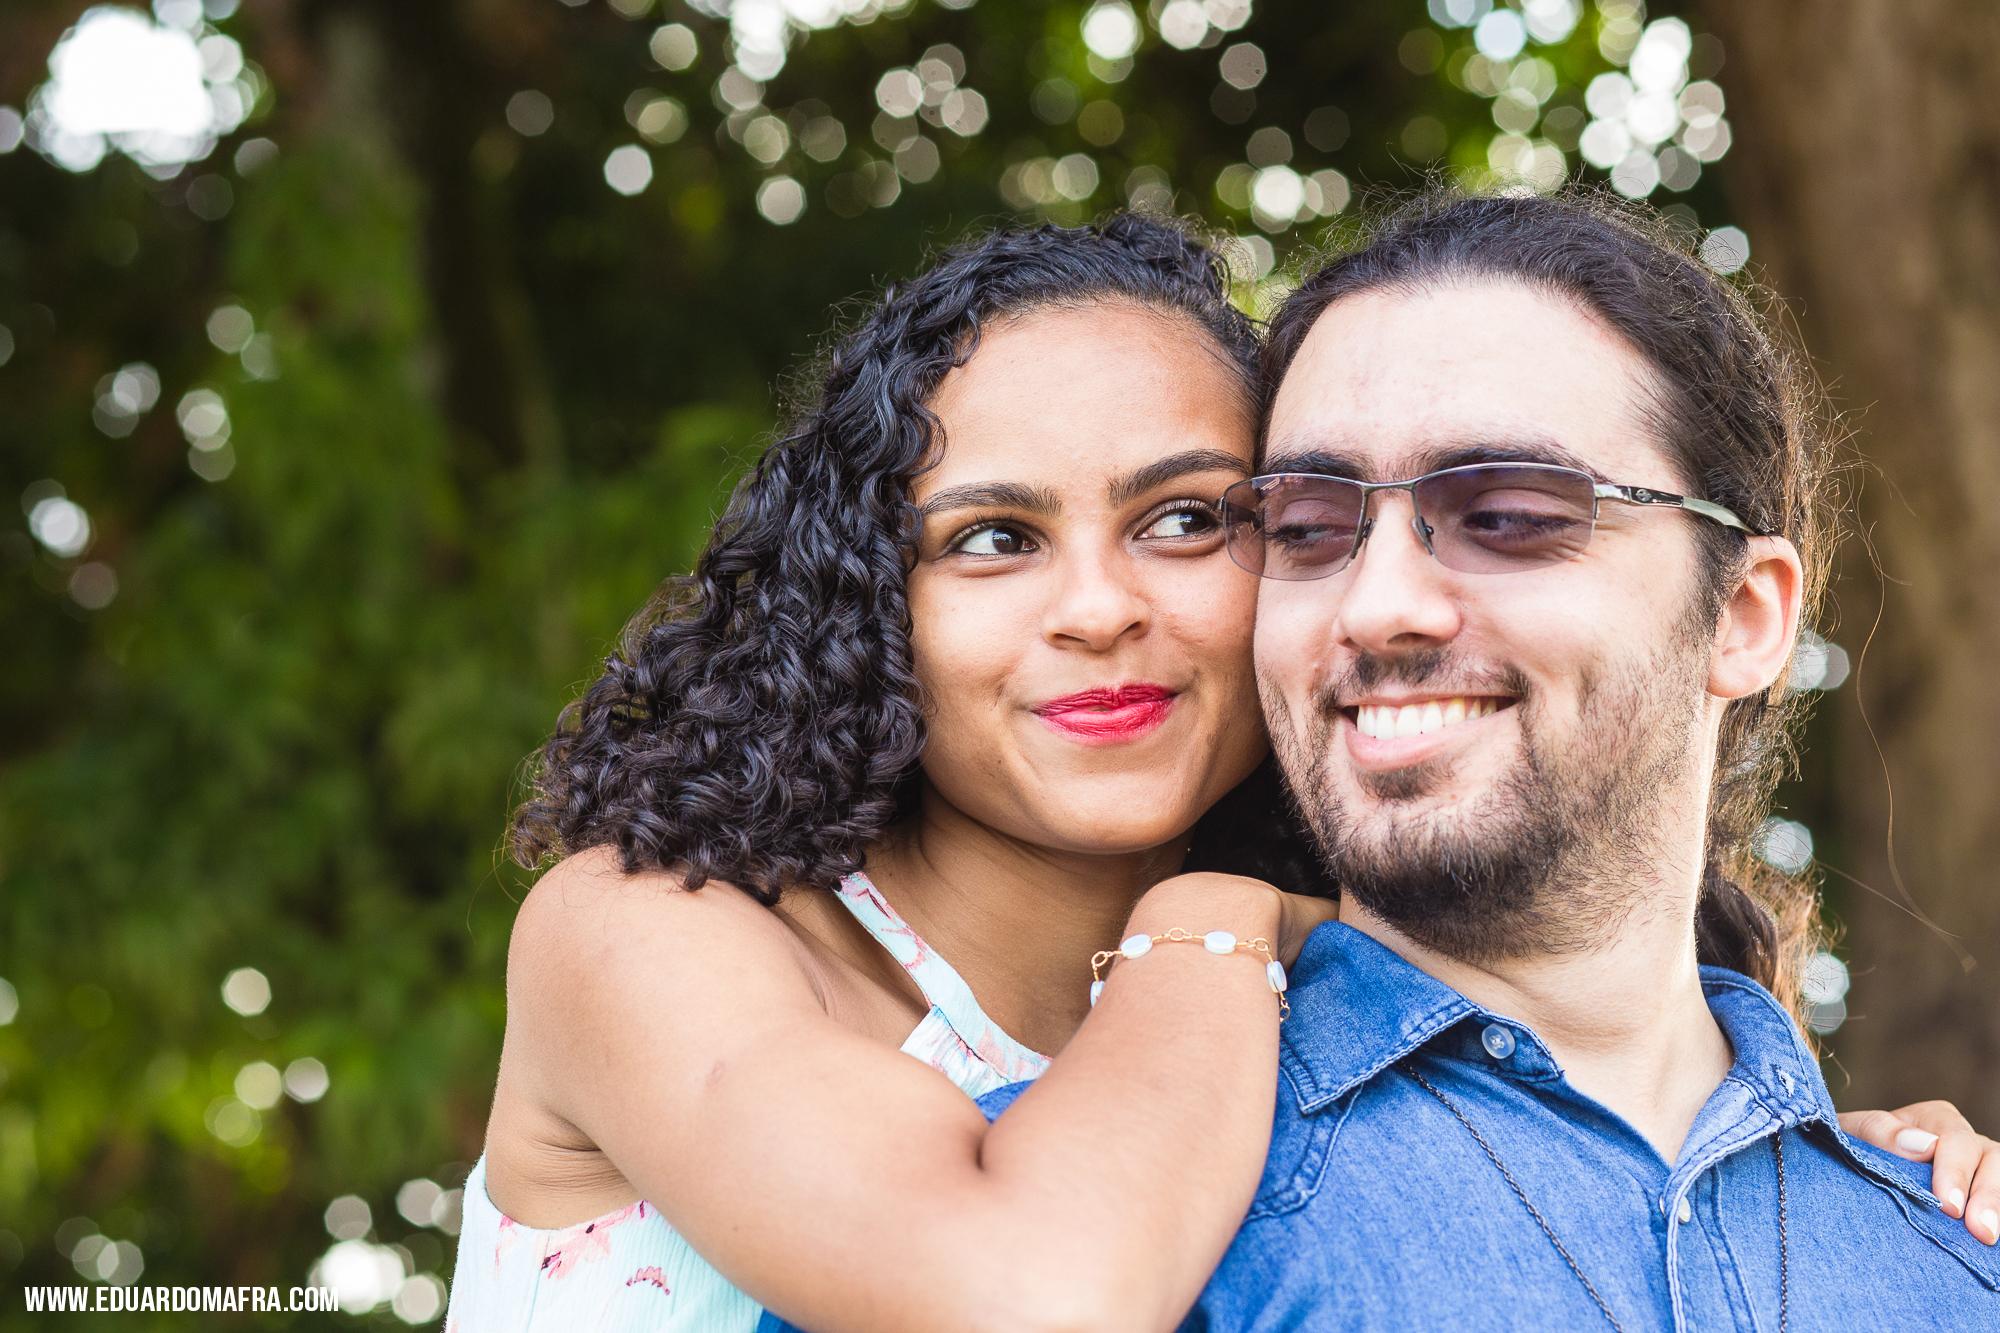 Ensaio fotográfico casal Carol e Tássio Salvador Lauro de Freitas fotógrafo profissional Vilas do Atlântico casamento noivado (1)